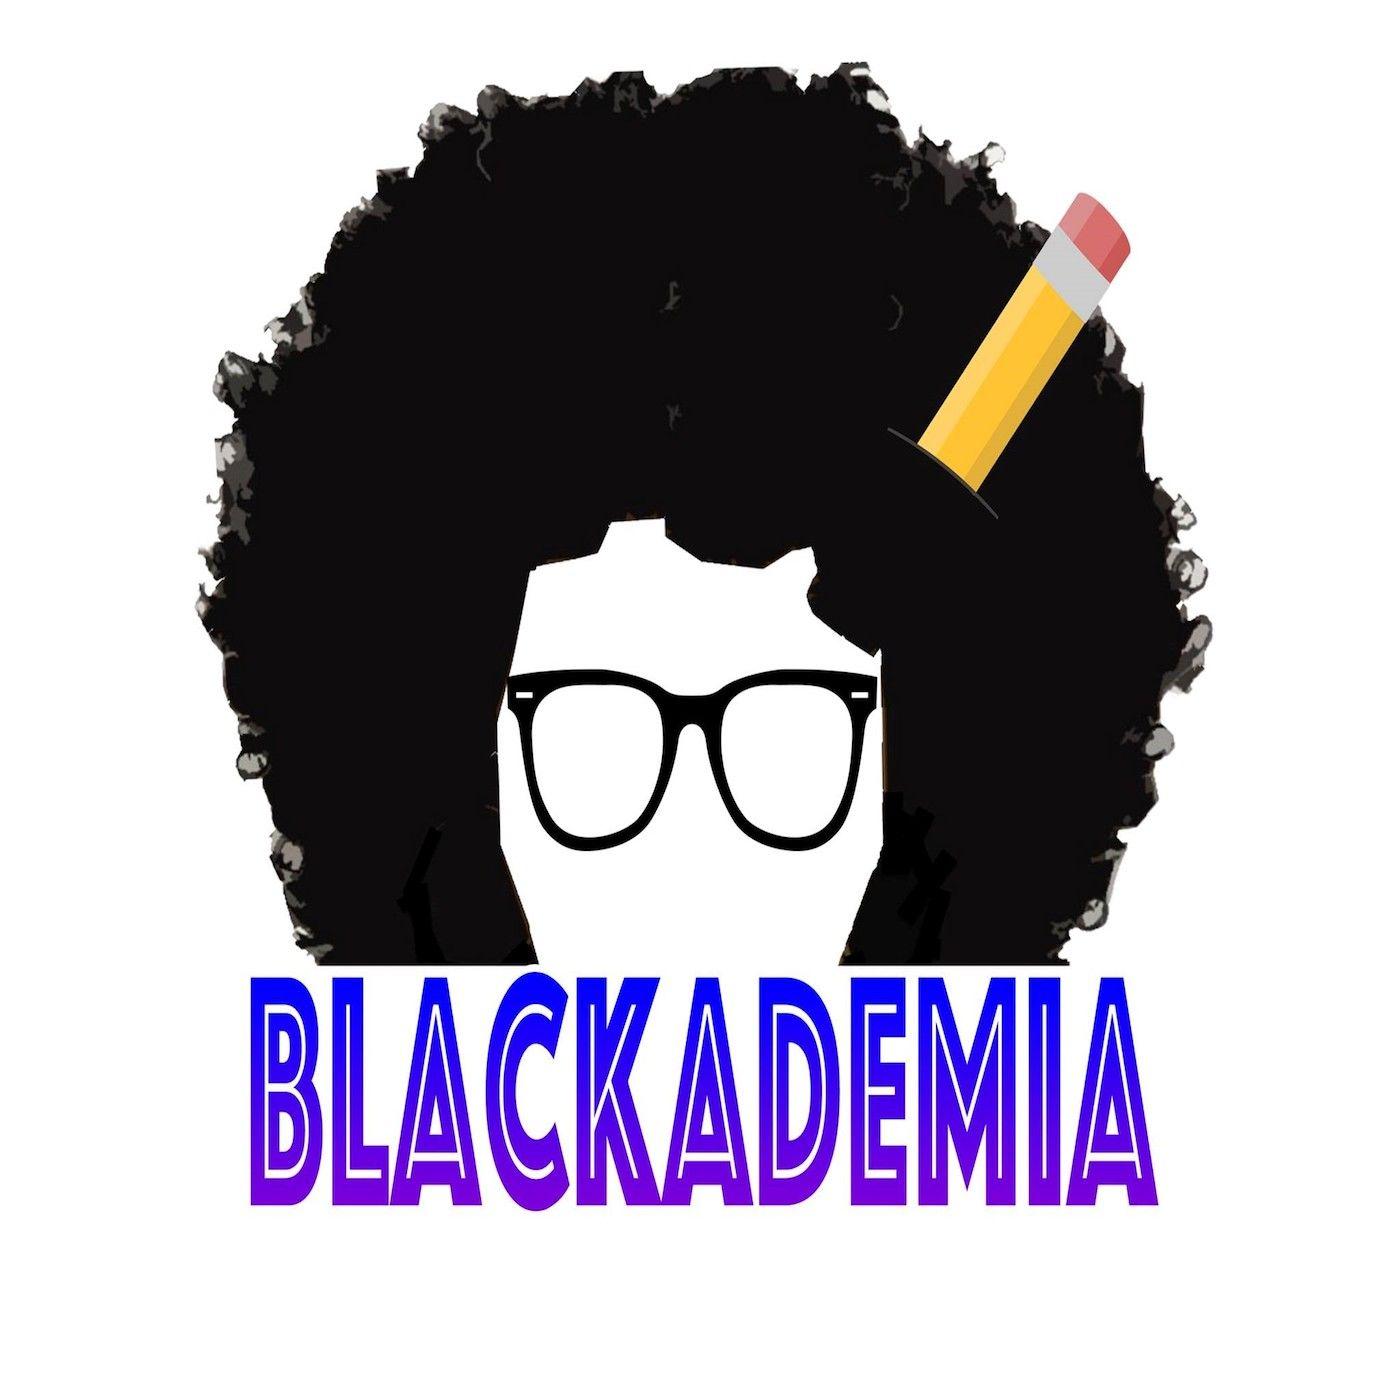 Blackademia